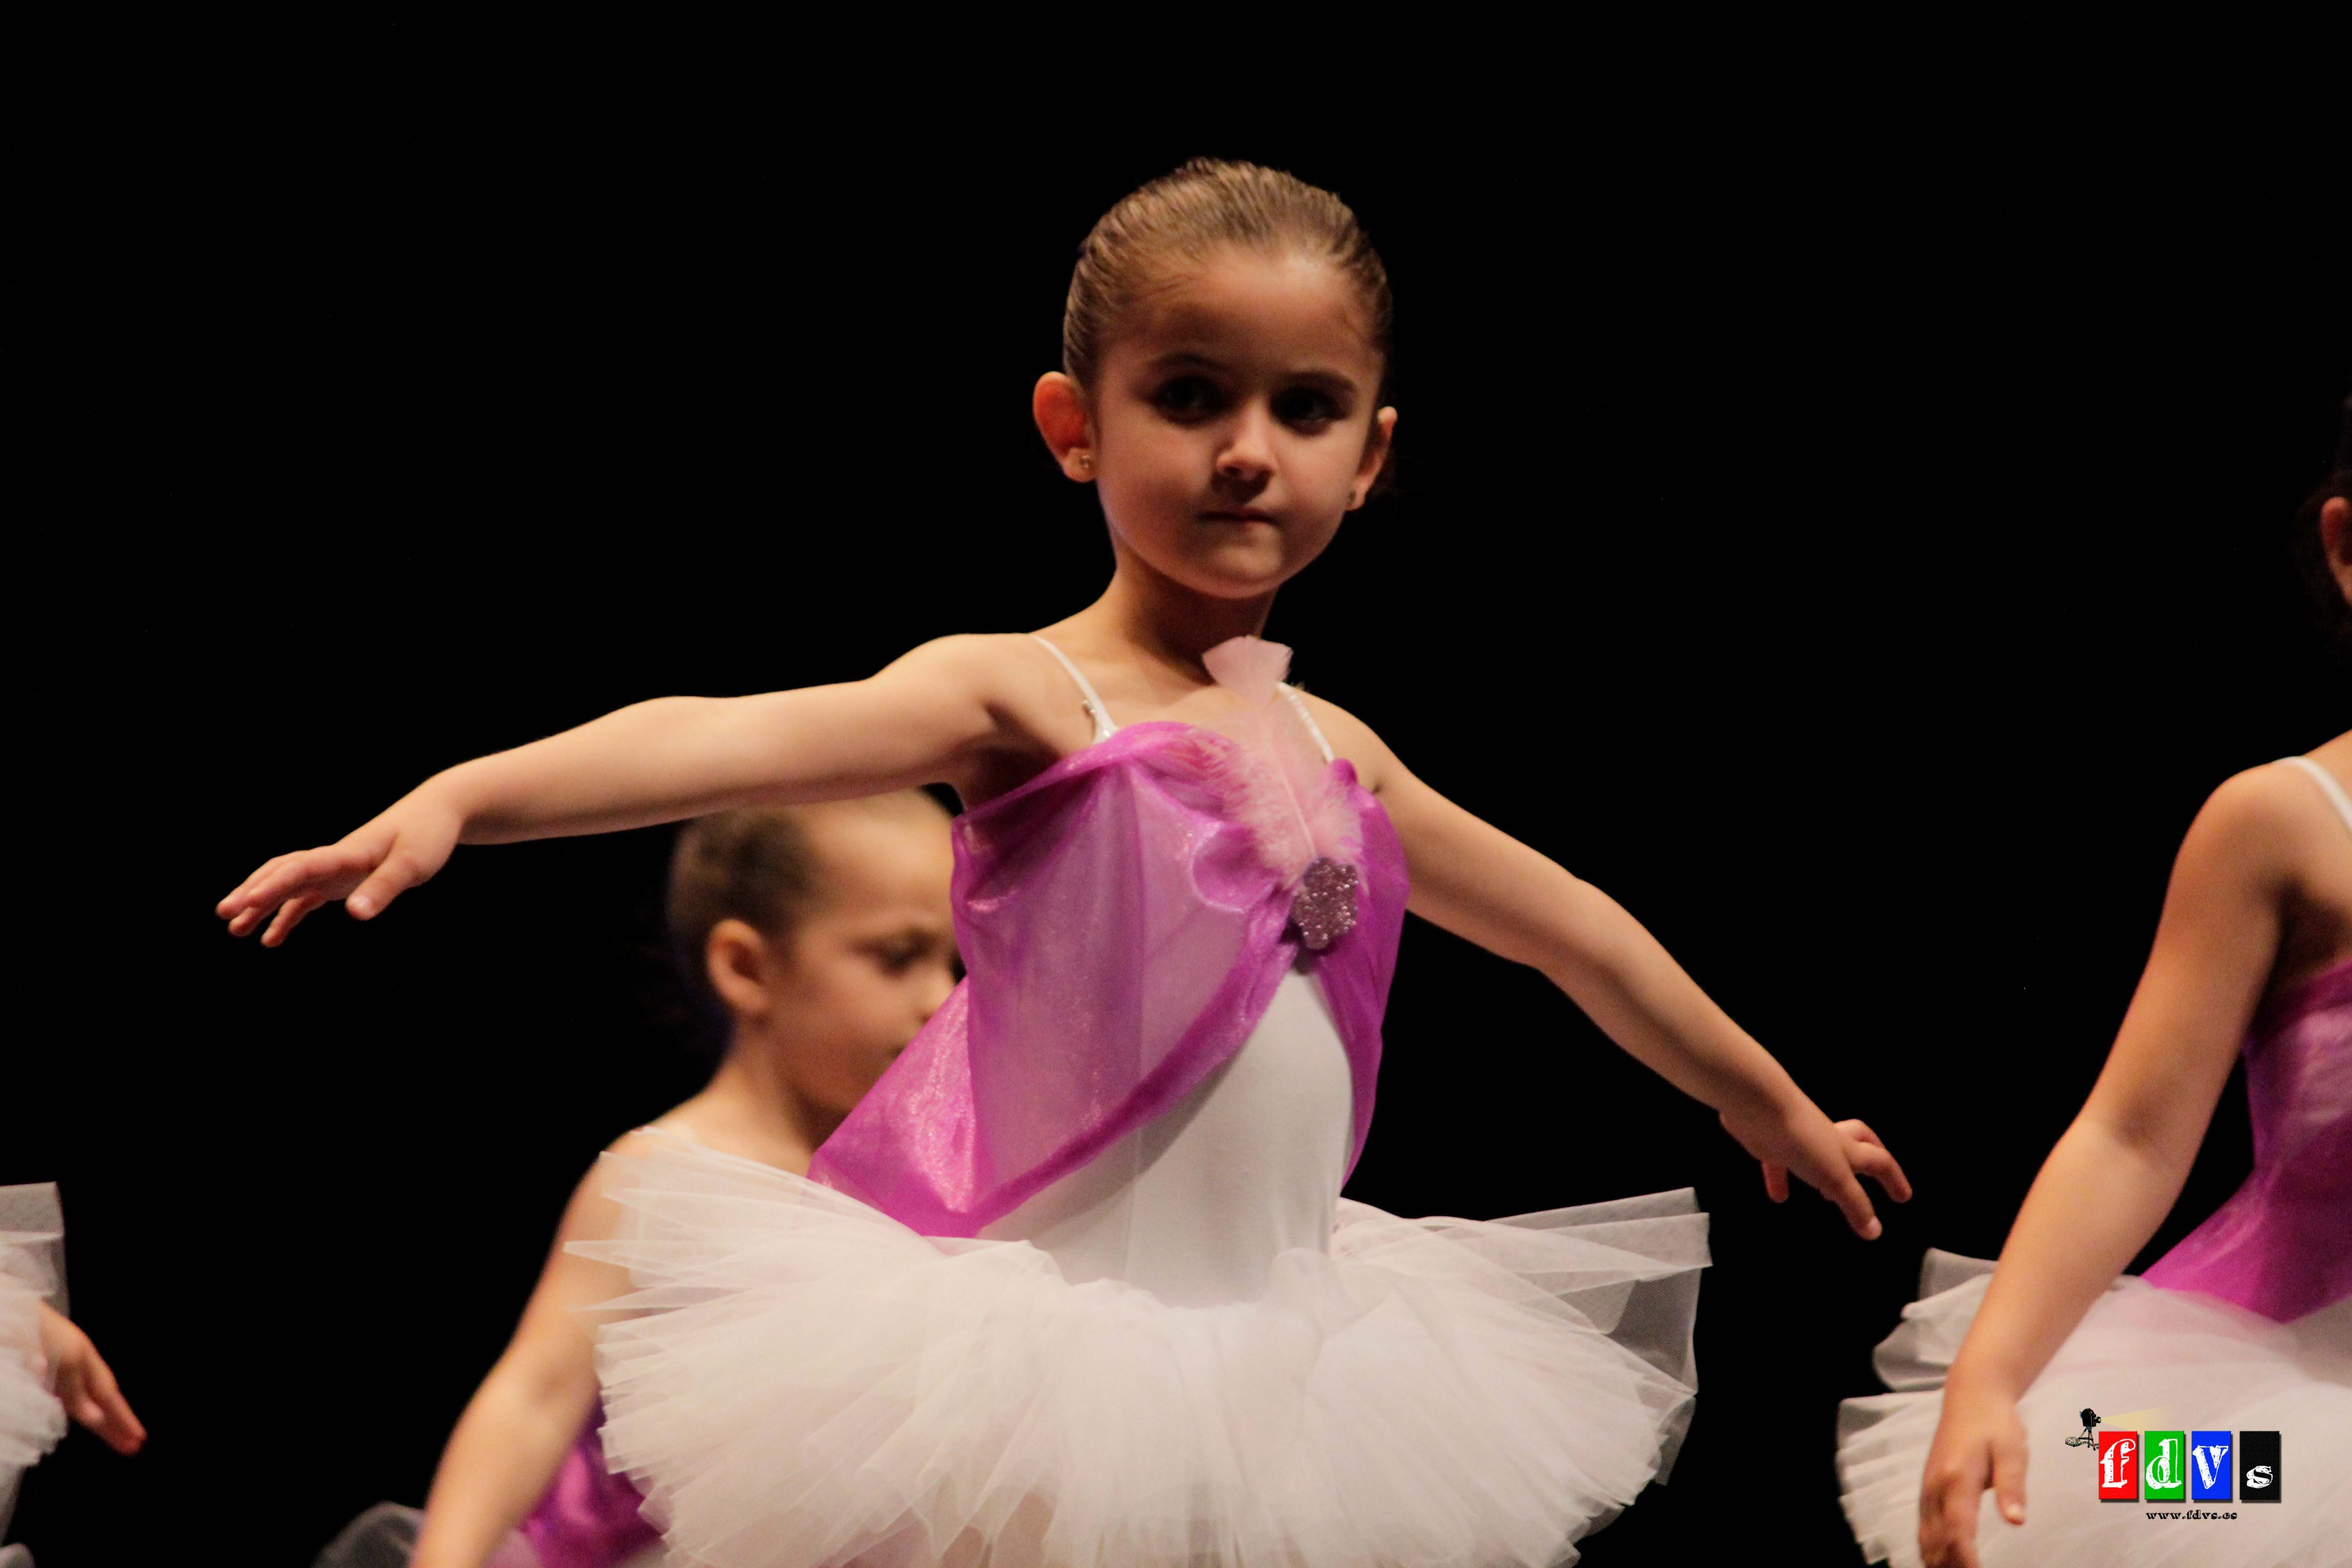 Serantes Kultur Aretoa 2014 - Primary